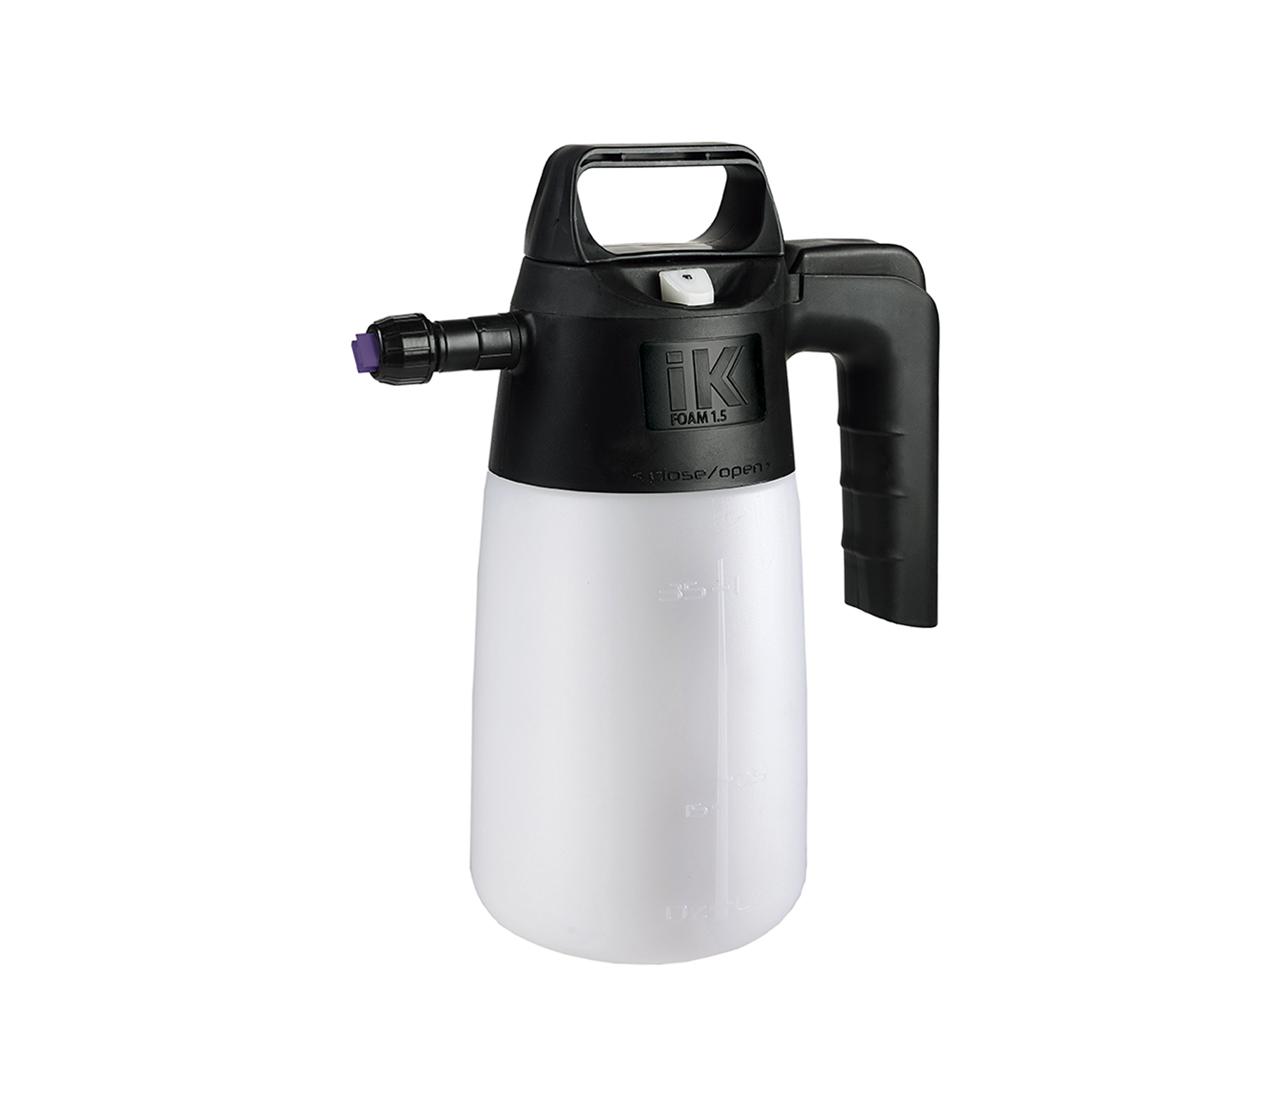 IK 35oz. Foam 1.5 Professional Handheld Trigger Sprayer